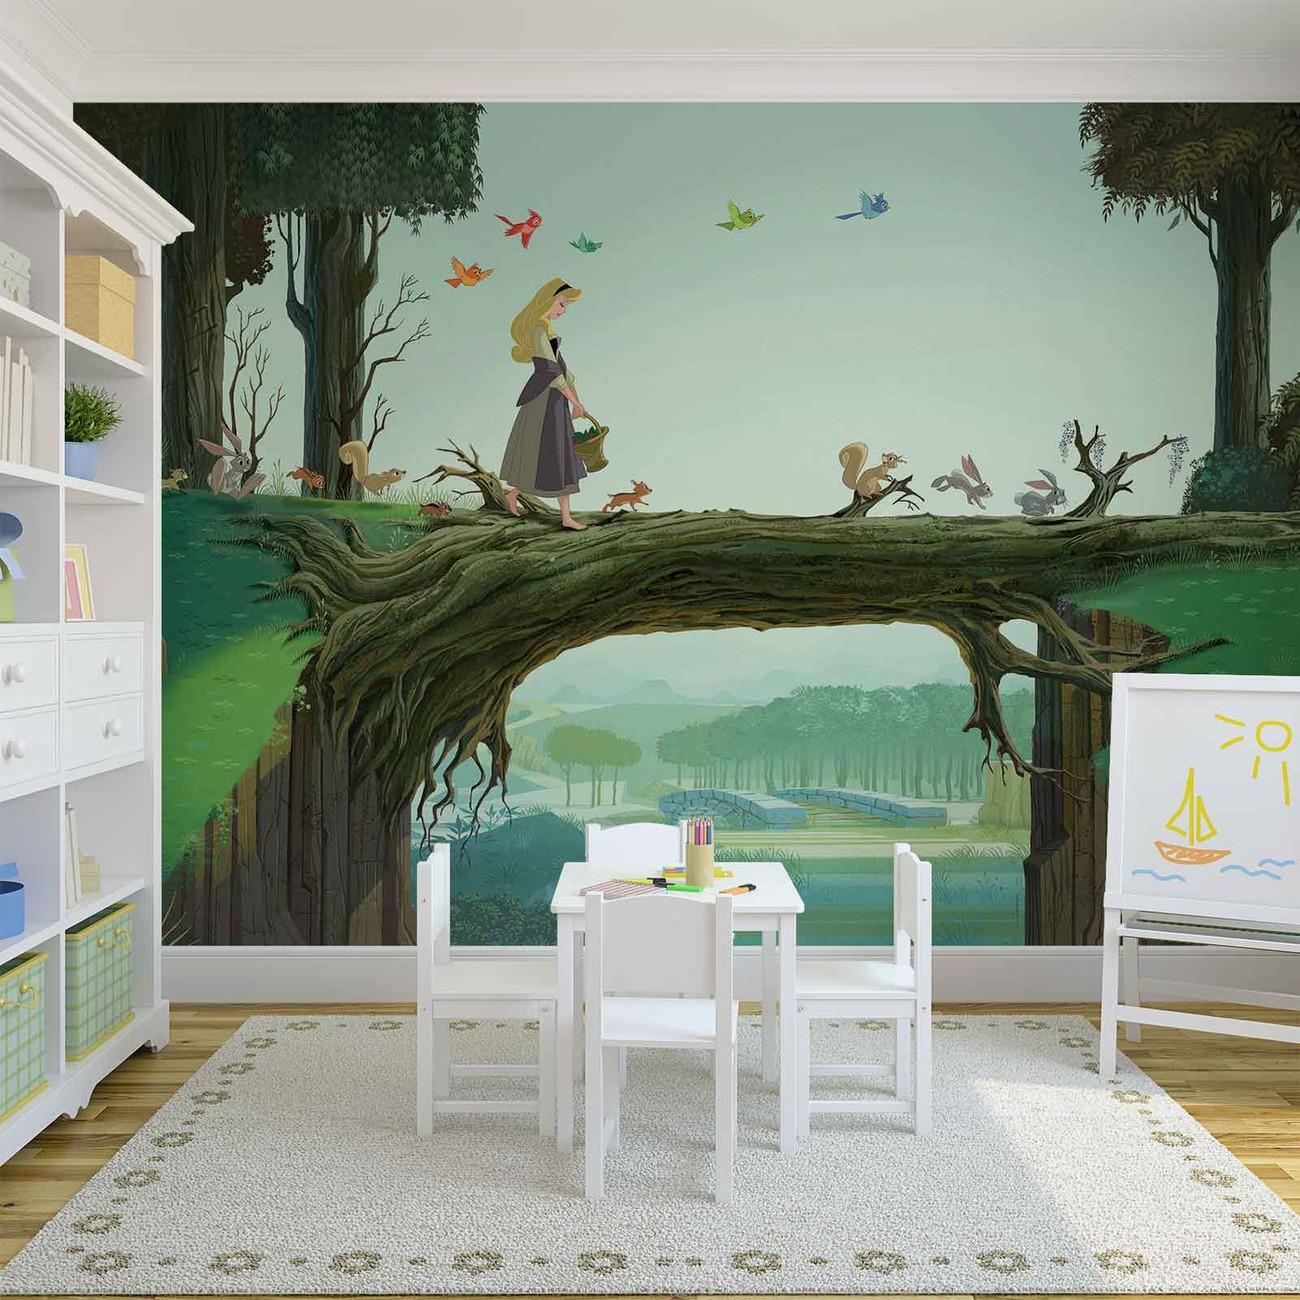 fototapete tapete disney prinzessinnen sleeping beauty bei europosters kostenloser versand. Black Bedroom Furniture Sets. Home Design Ideas